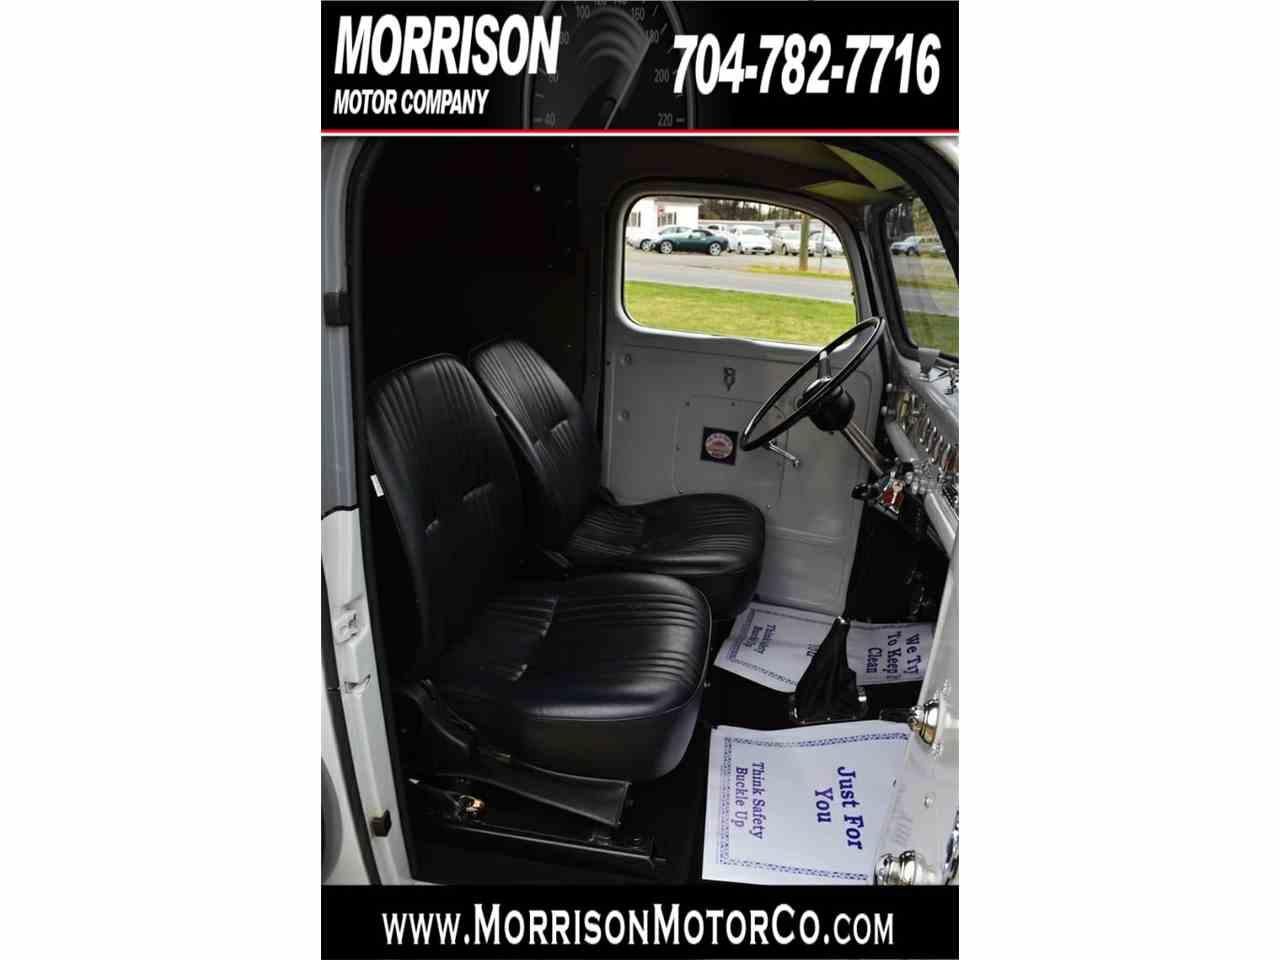 North carolina vehicle inspection manual 17